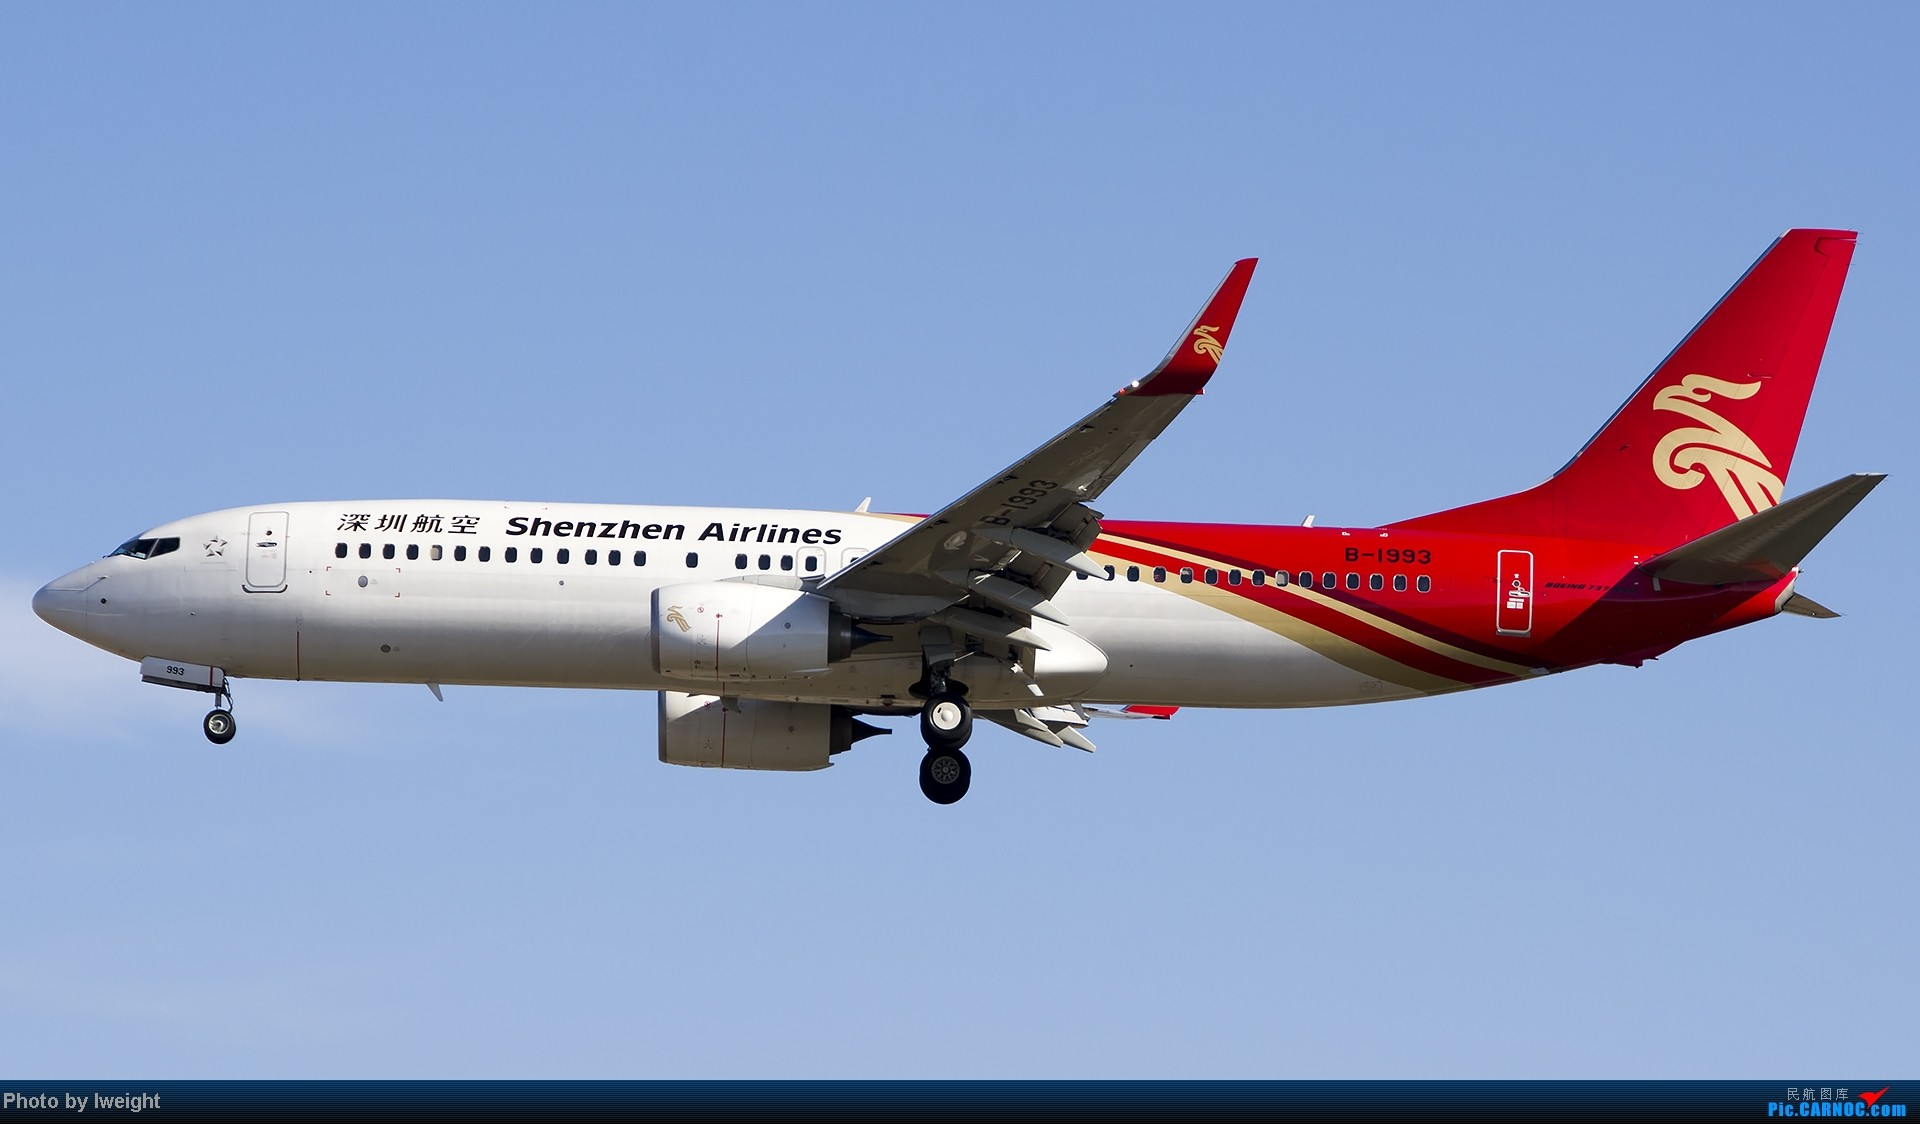 Re:[原创]抓住APEC蓝的尾巴,再拍上一组 BOEING 737-800 B-1993 中国北京首都机场